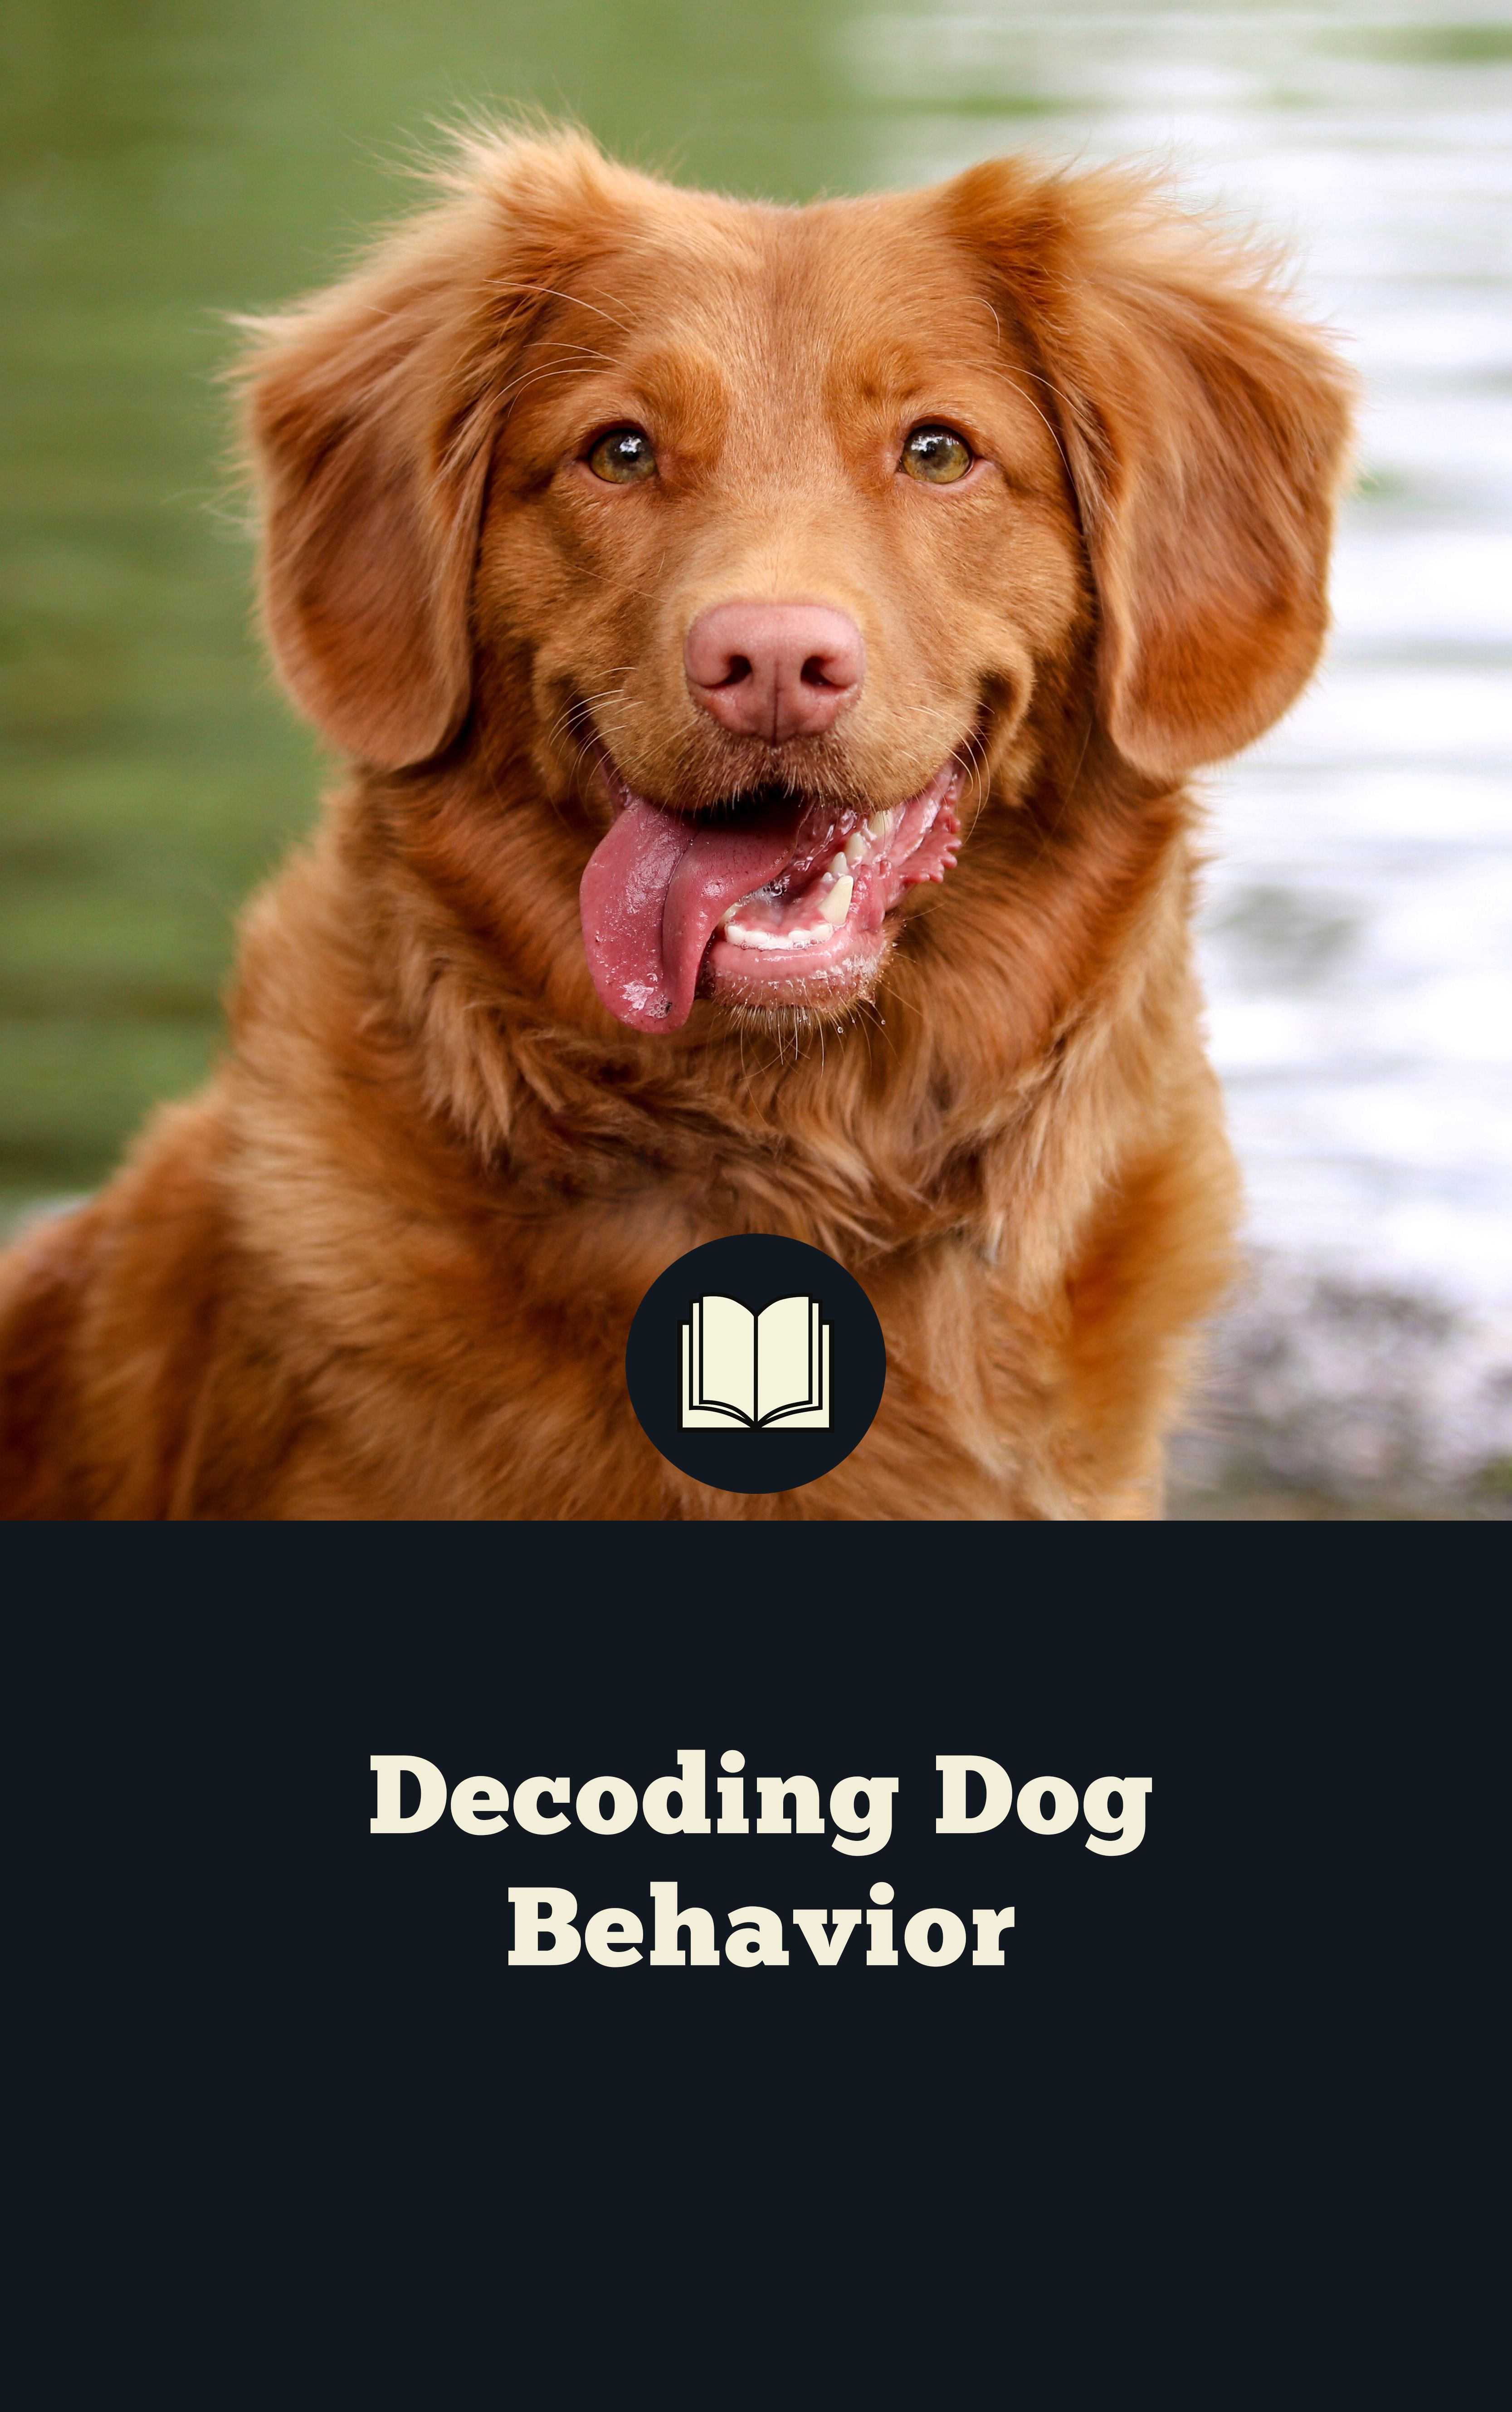 How To Decode Dog Behavior With Images Dog Communication Dog